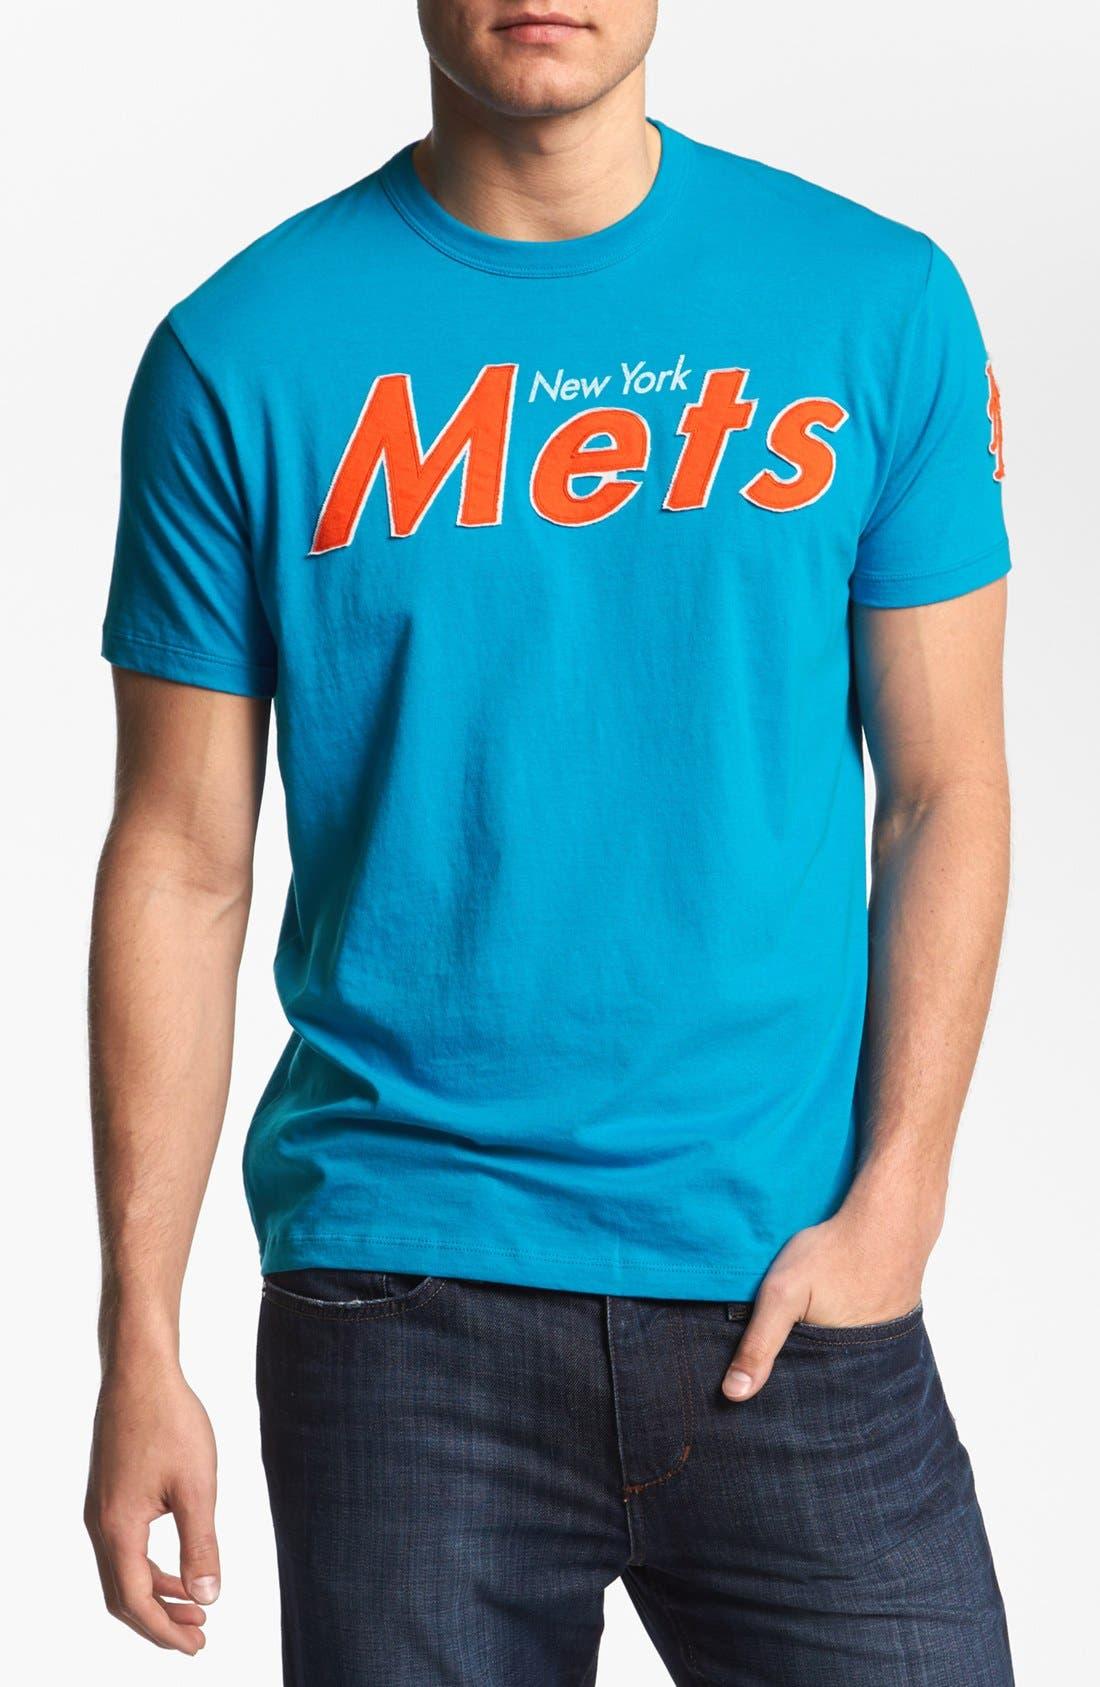 Alternate Image 1 Selected - 47 Brand 'New York Mets - Fieldhouse' T-Shirt